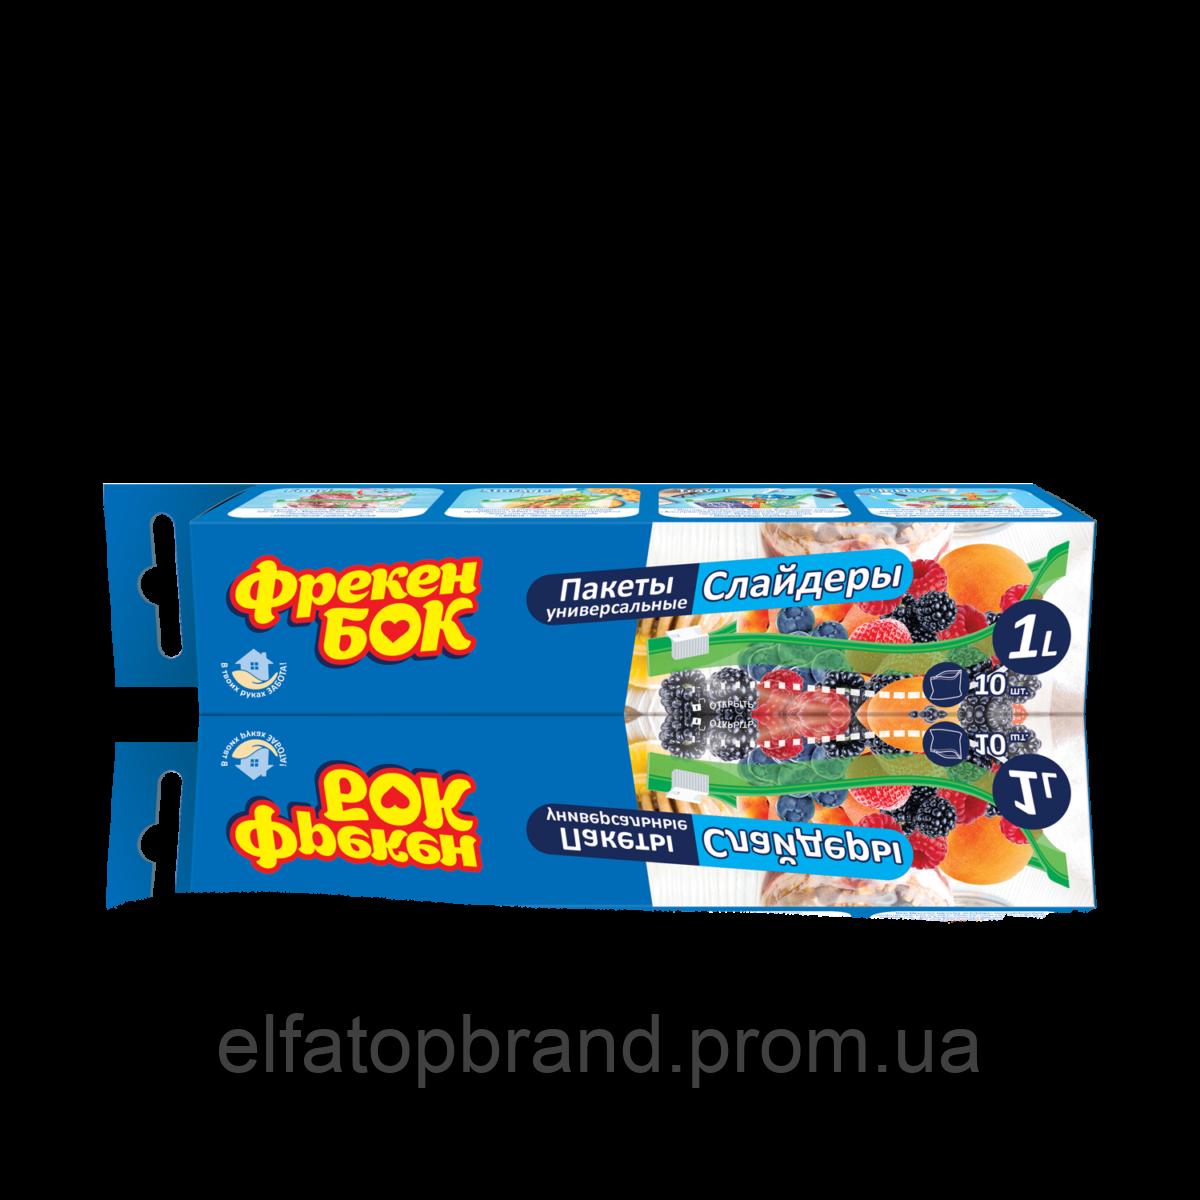 Пакеты Зипперы Для Хранения И Заморозки М Фрекен Бок 10 шт